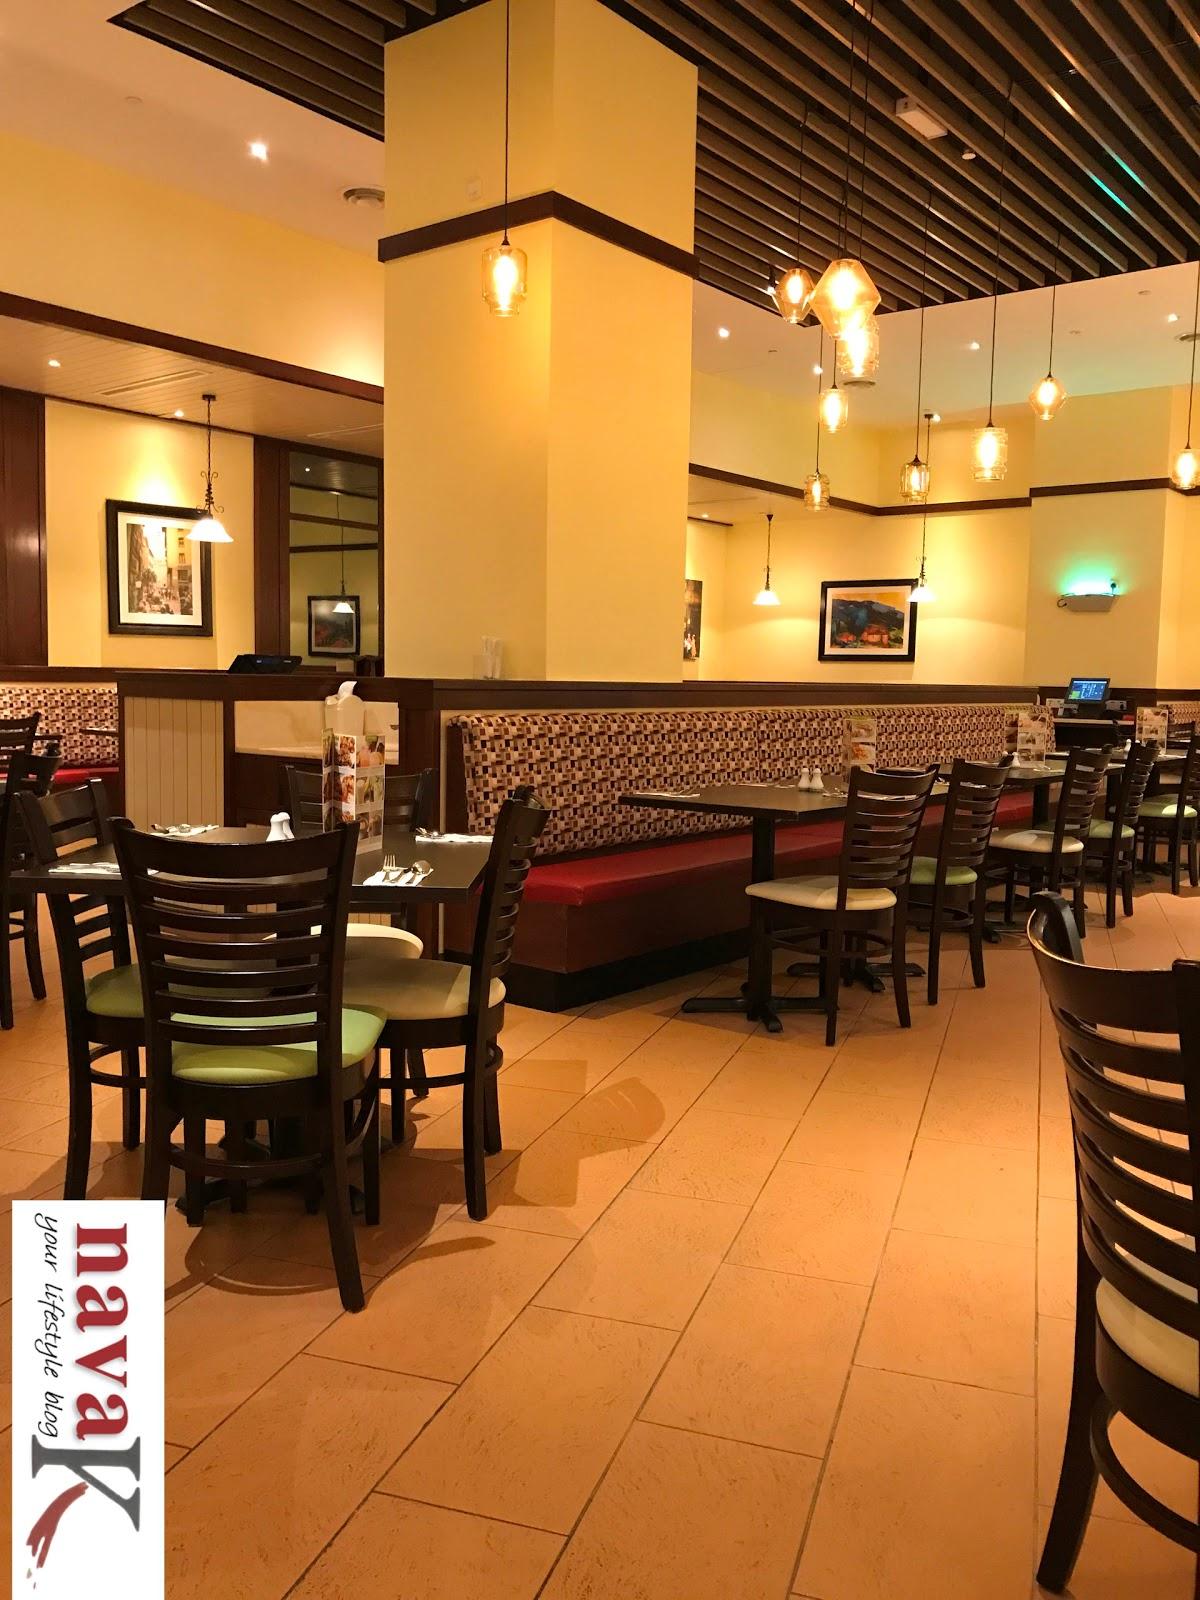 nava-k: Olive Garden - AEON Mall, Seksyen 13 (Shah Alam)